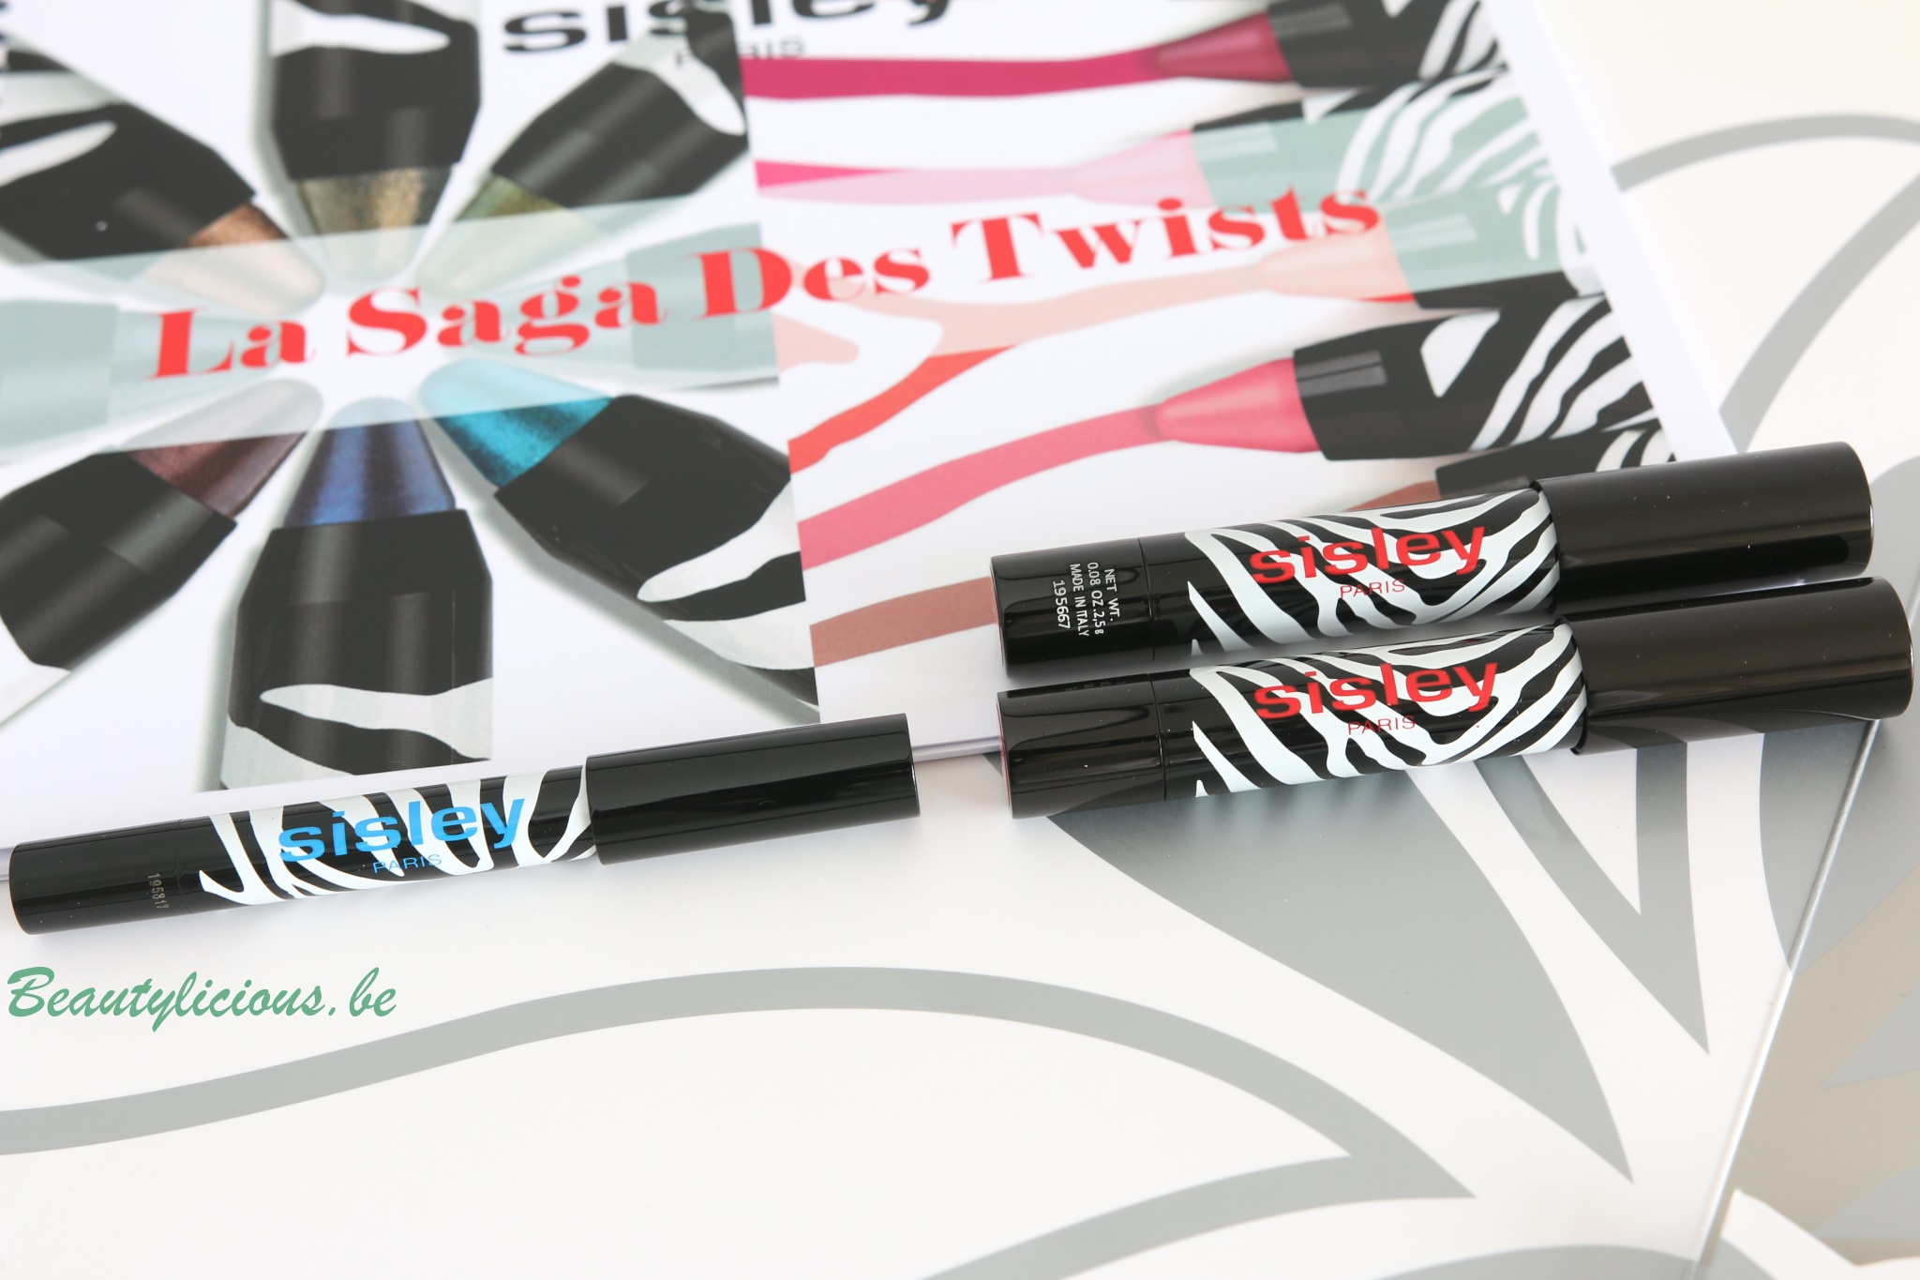 La version mat des Phyto-Lip Twist de Sisley ? Je dis oui